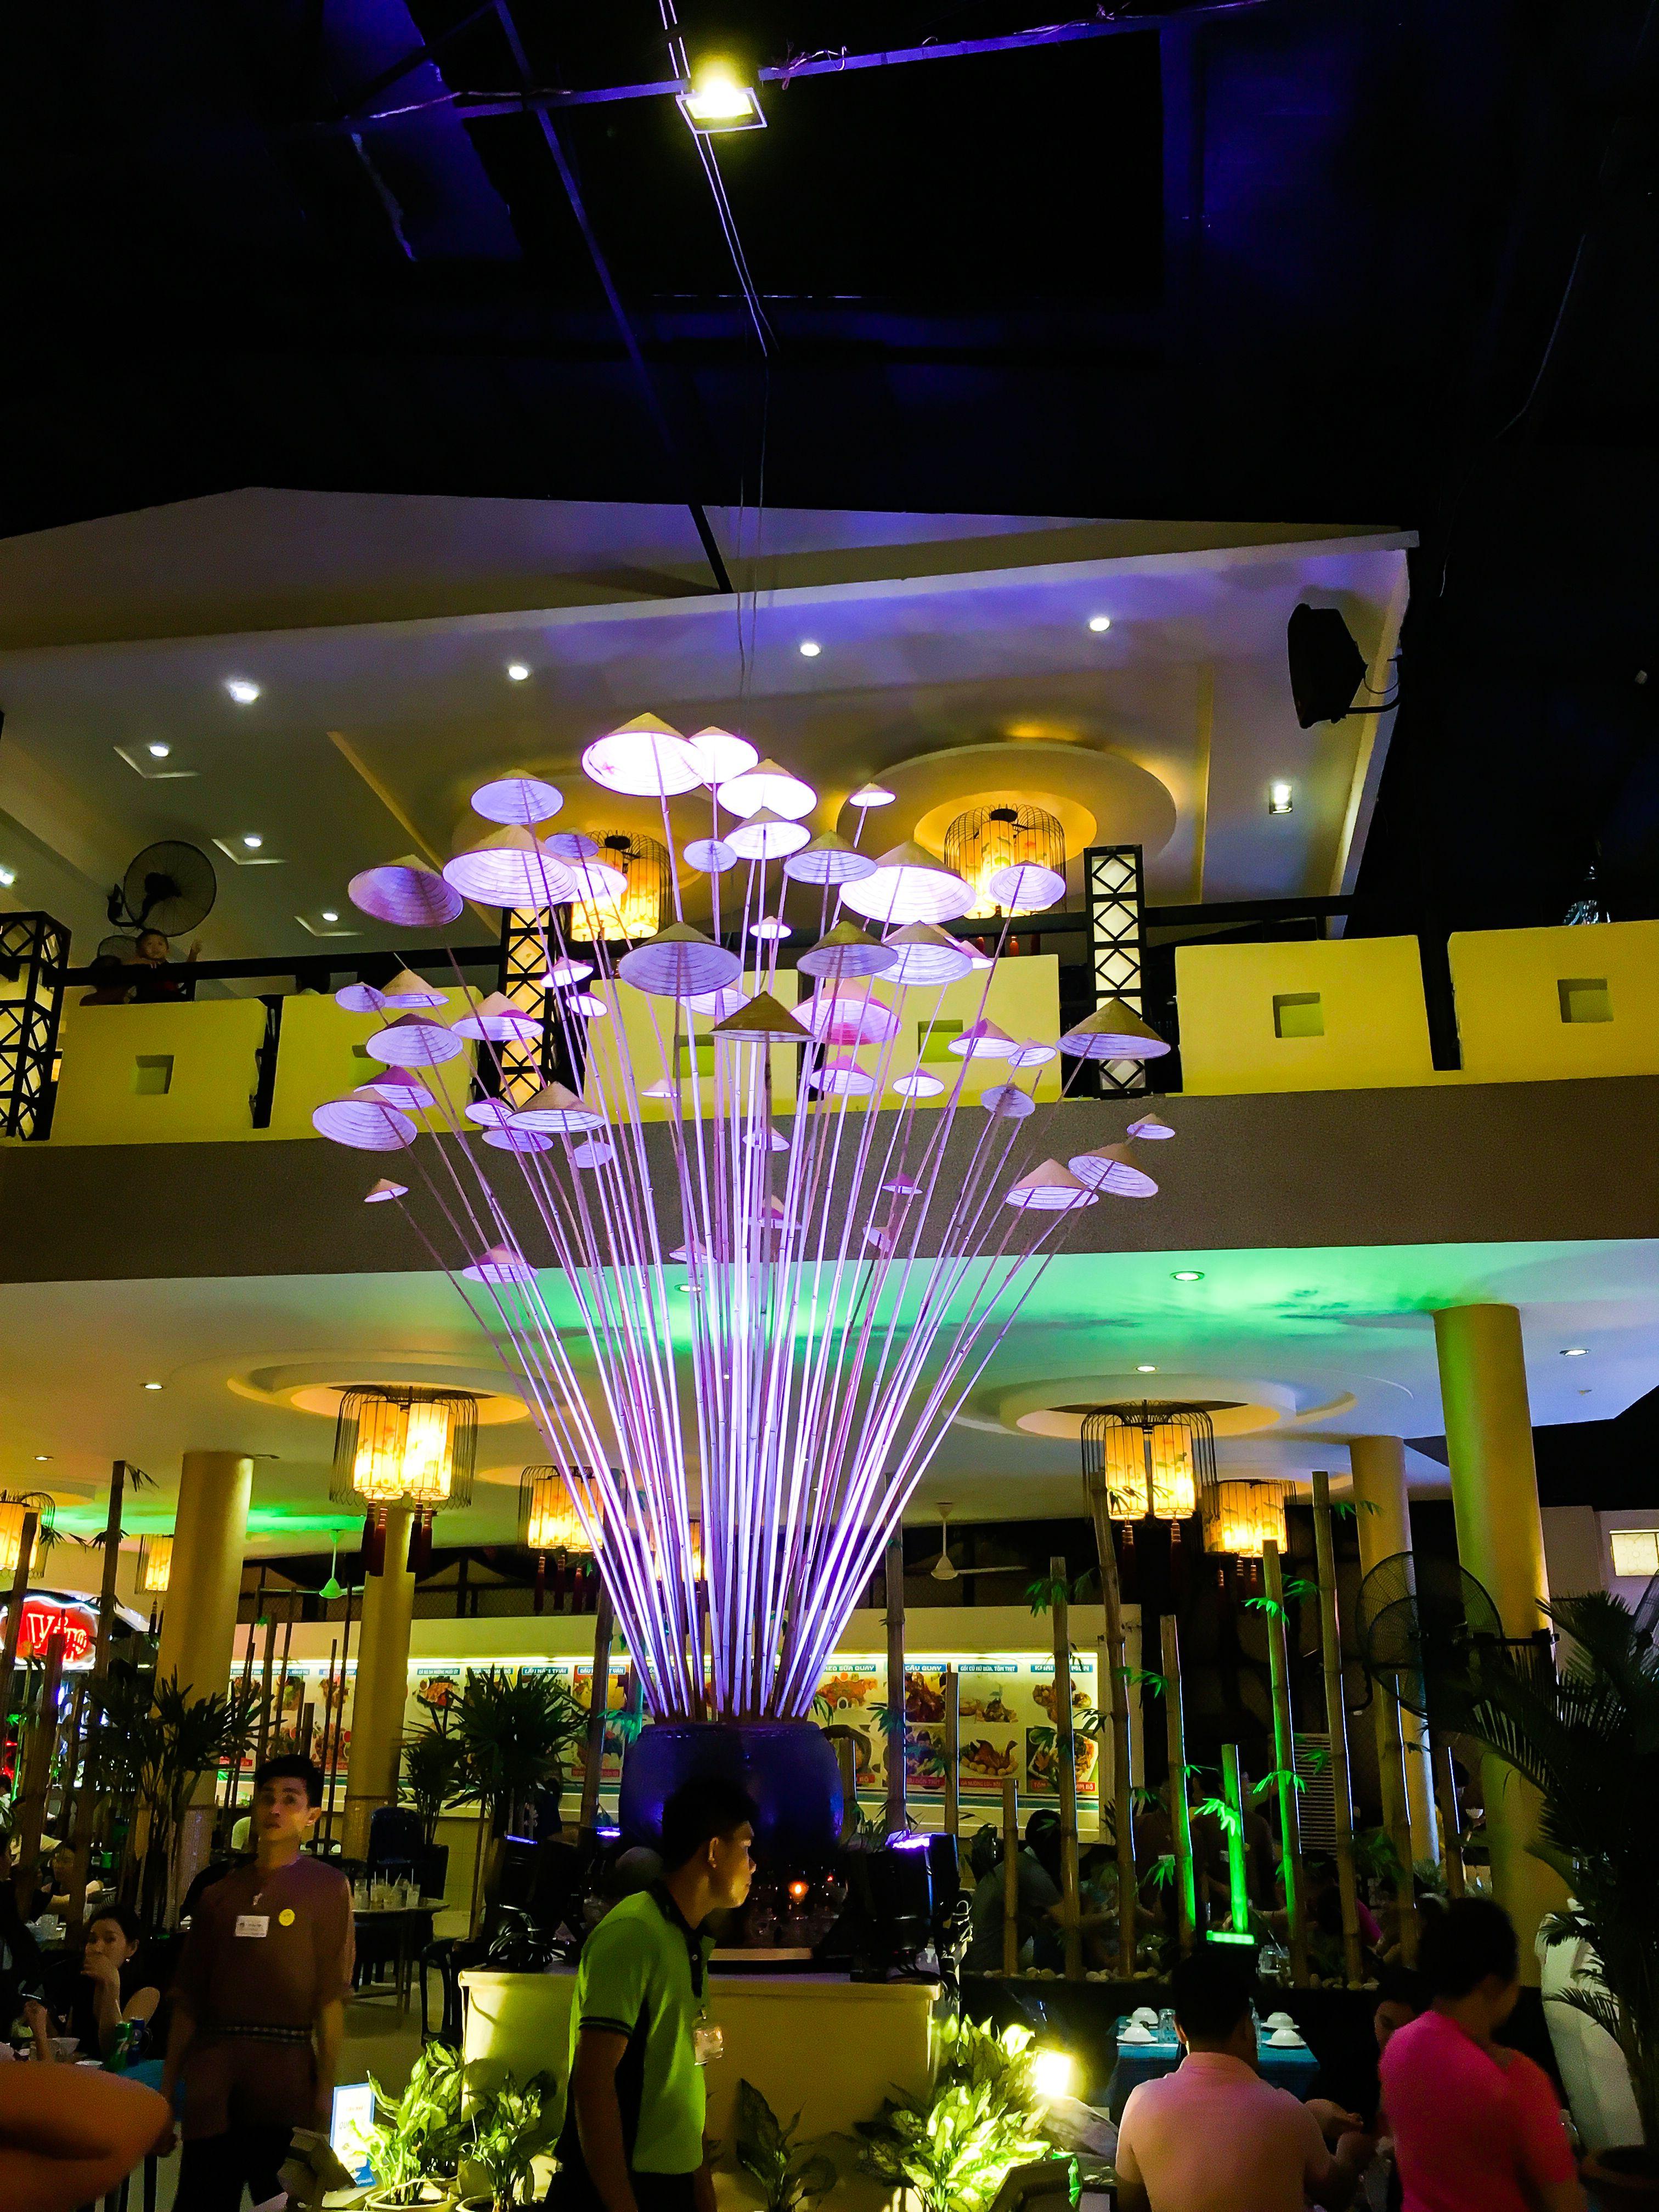 'Lang nuong nam bo' restaurant